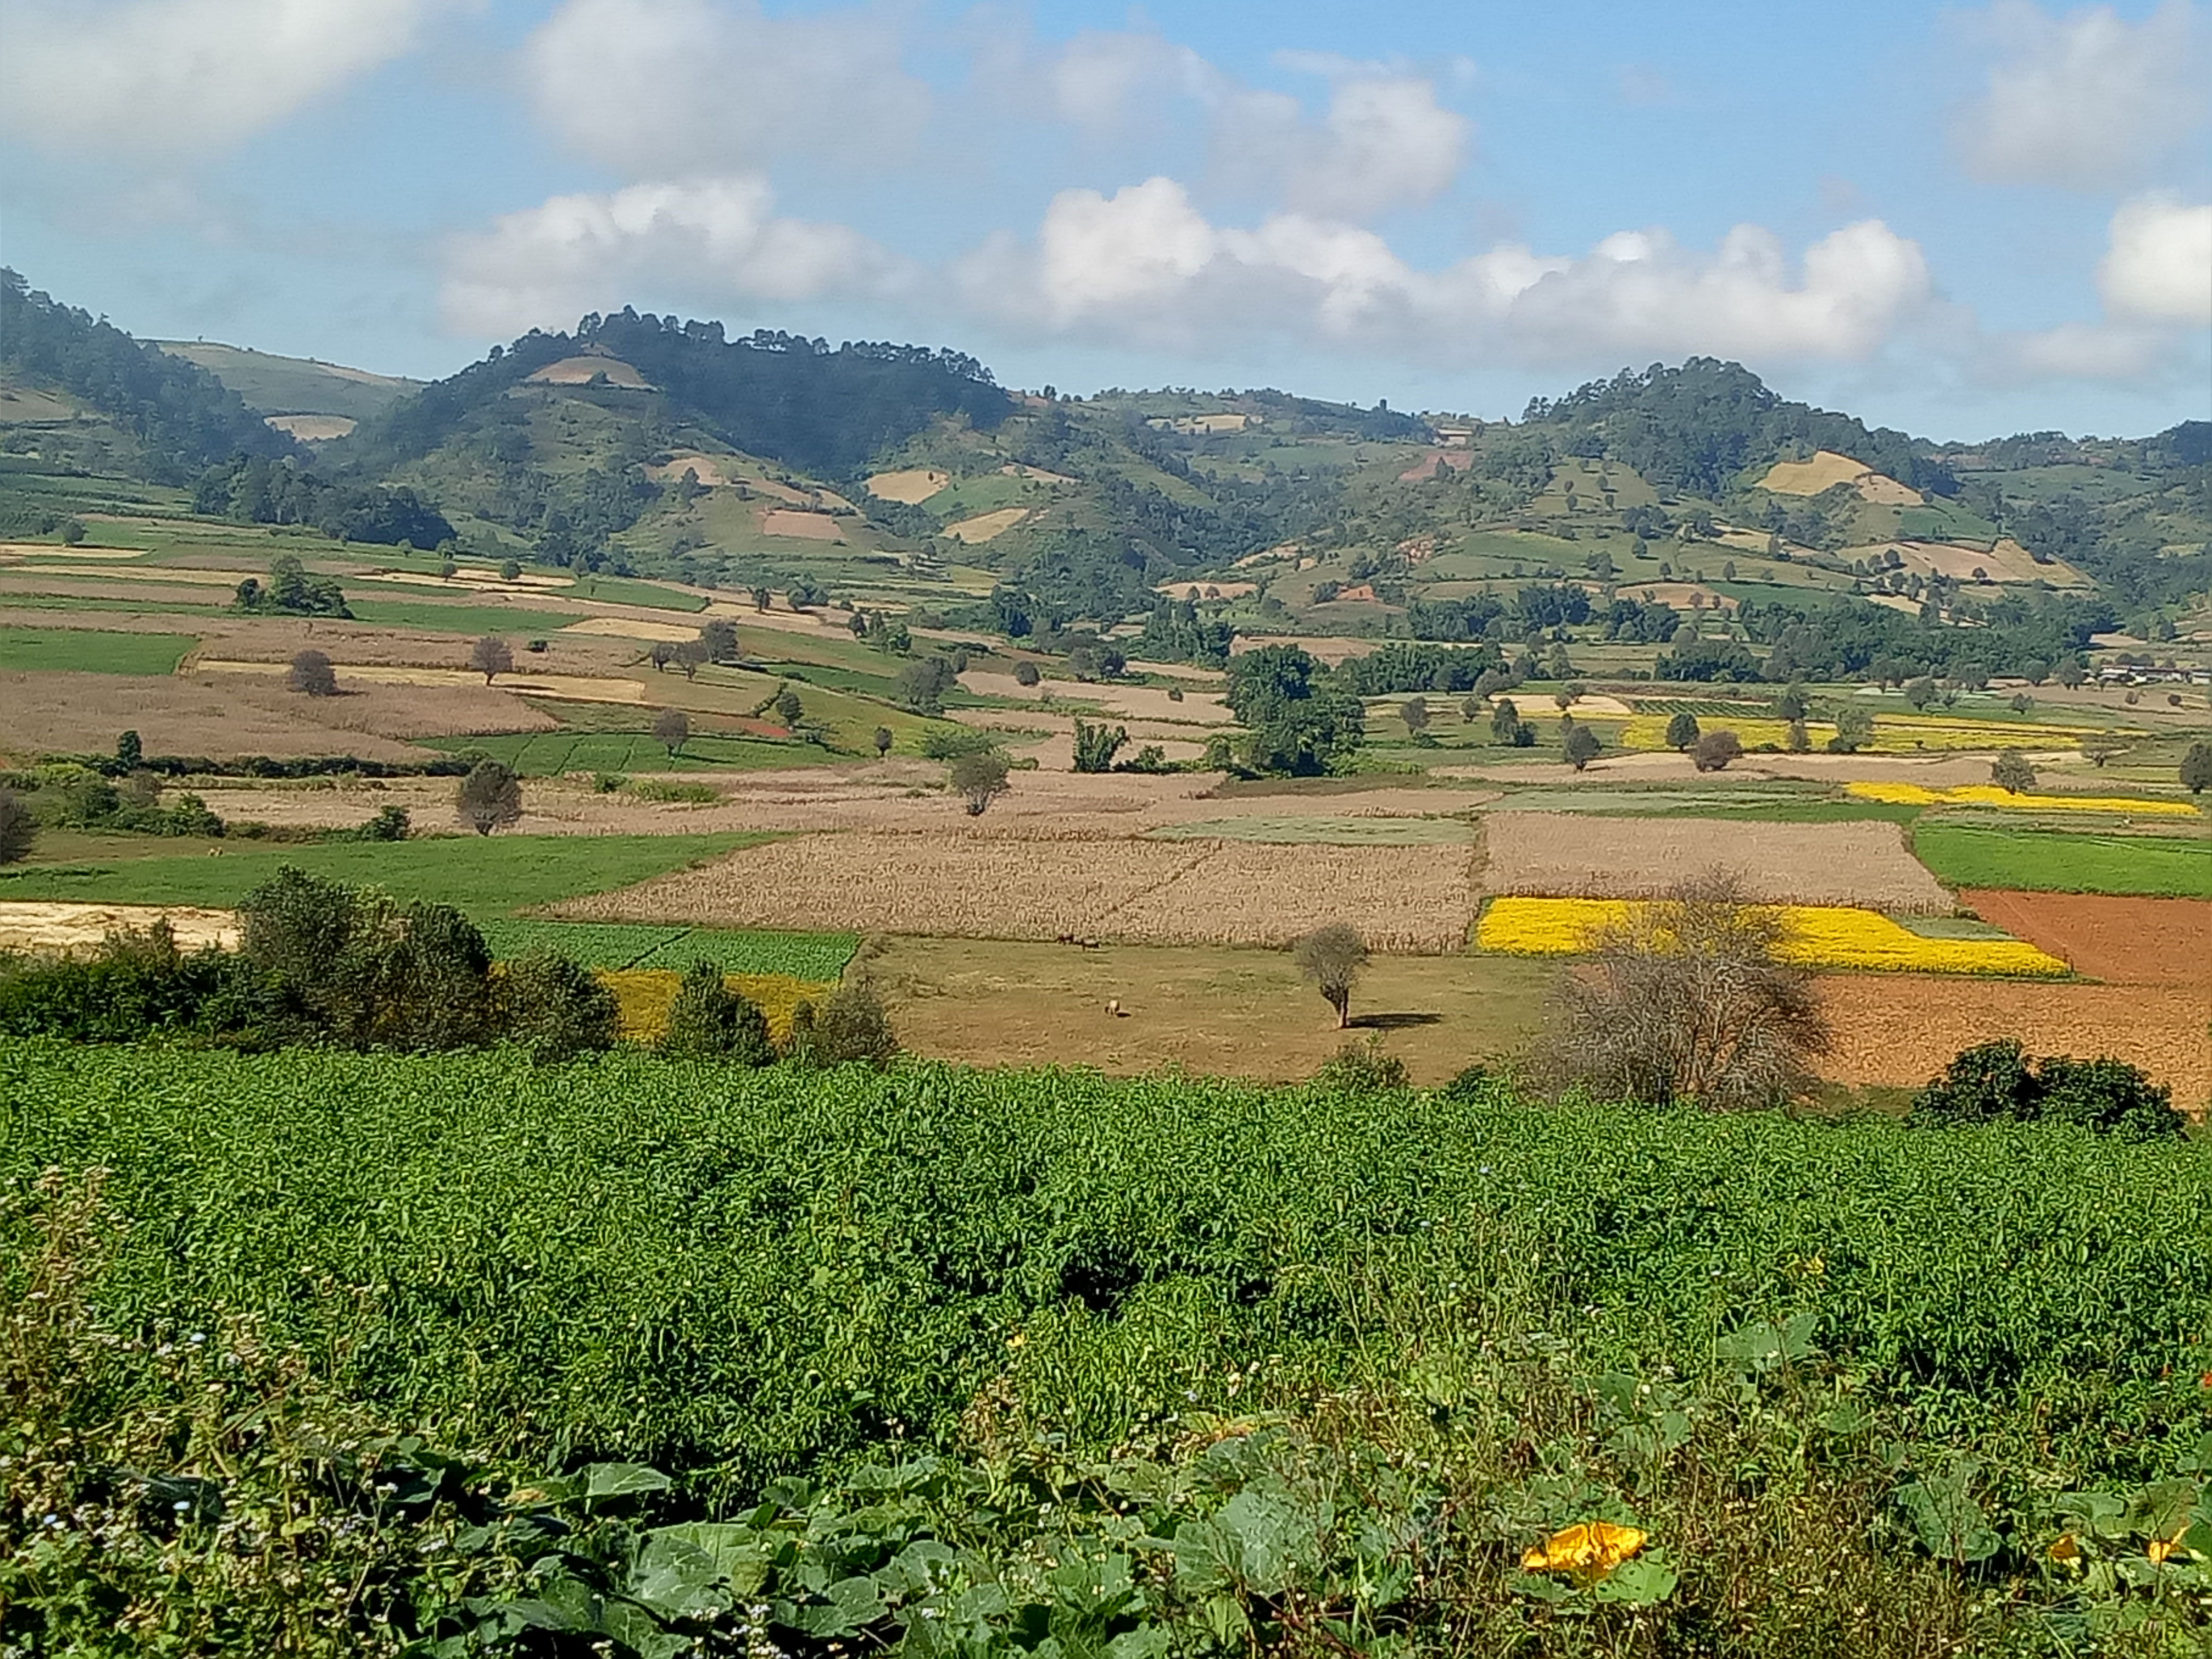 Trek Through the Hills and Sight Unique Plantation